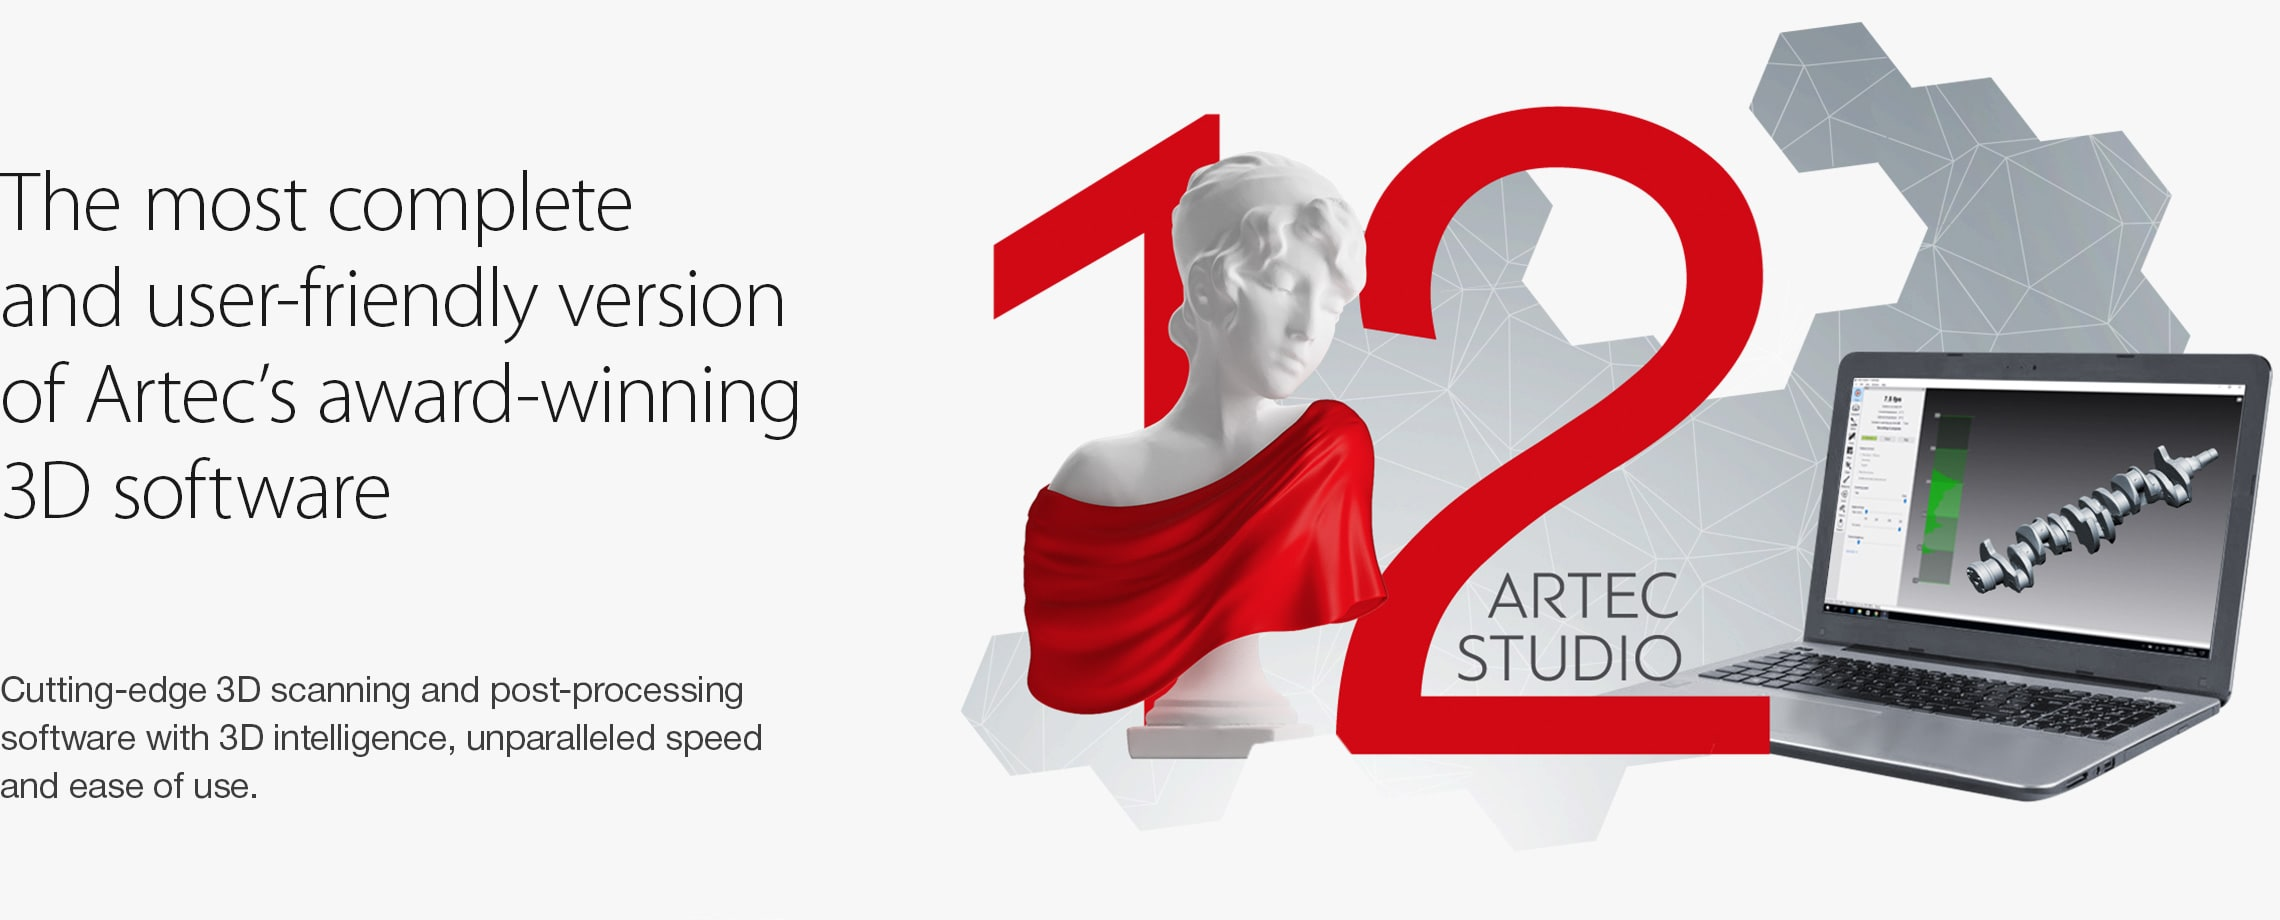 Artec 3D – HiWay Technologies   3D Printing